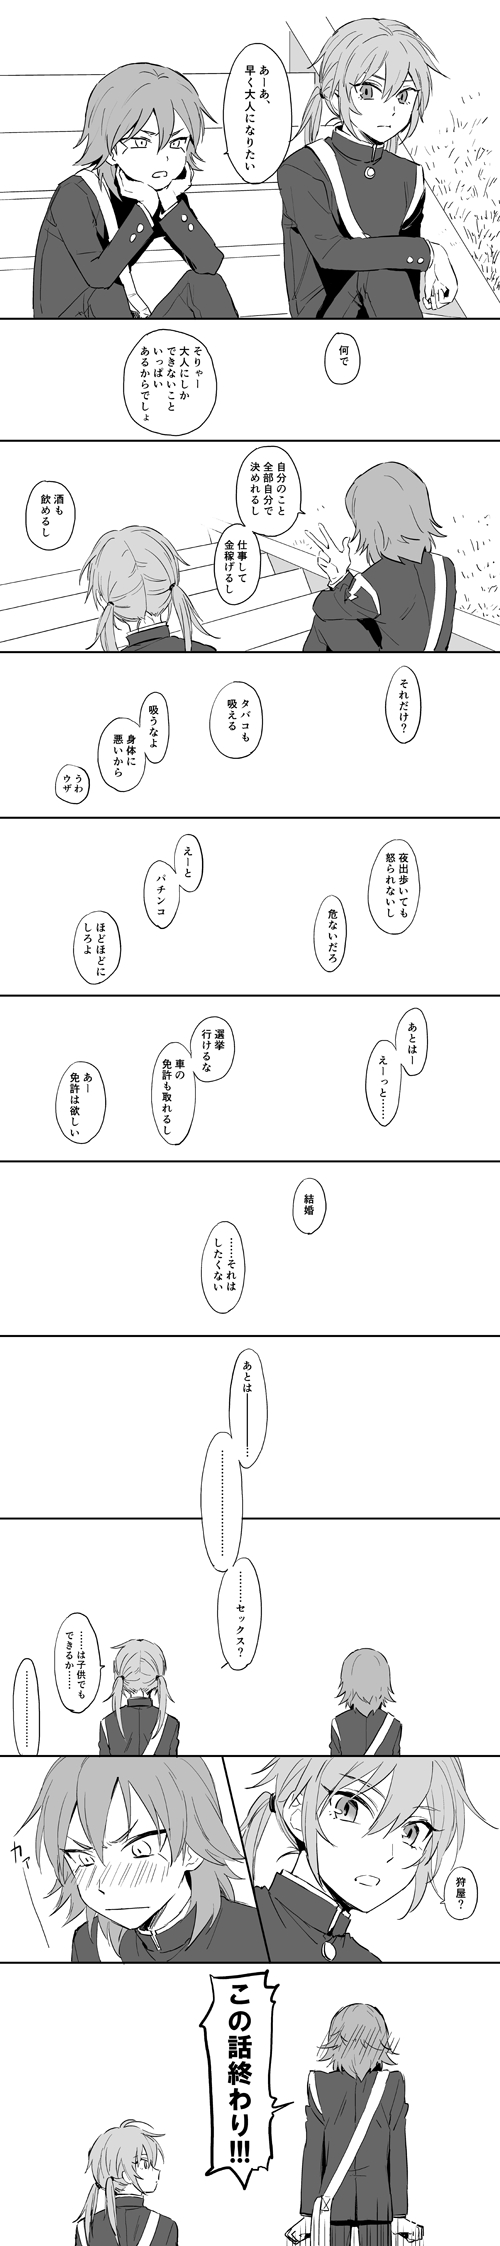 Tags: Anime, Pixiv Id 435512, Inazuma Eleven GO, Kariya Masaki, Kirino Ranmaru, PNG Conversion, Pixiv, Fanart, Fanart From Pixiv